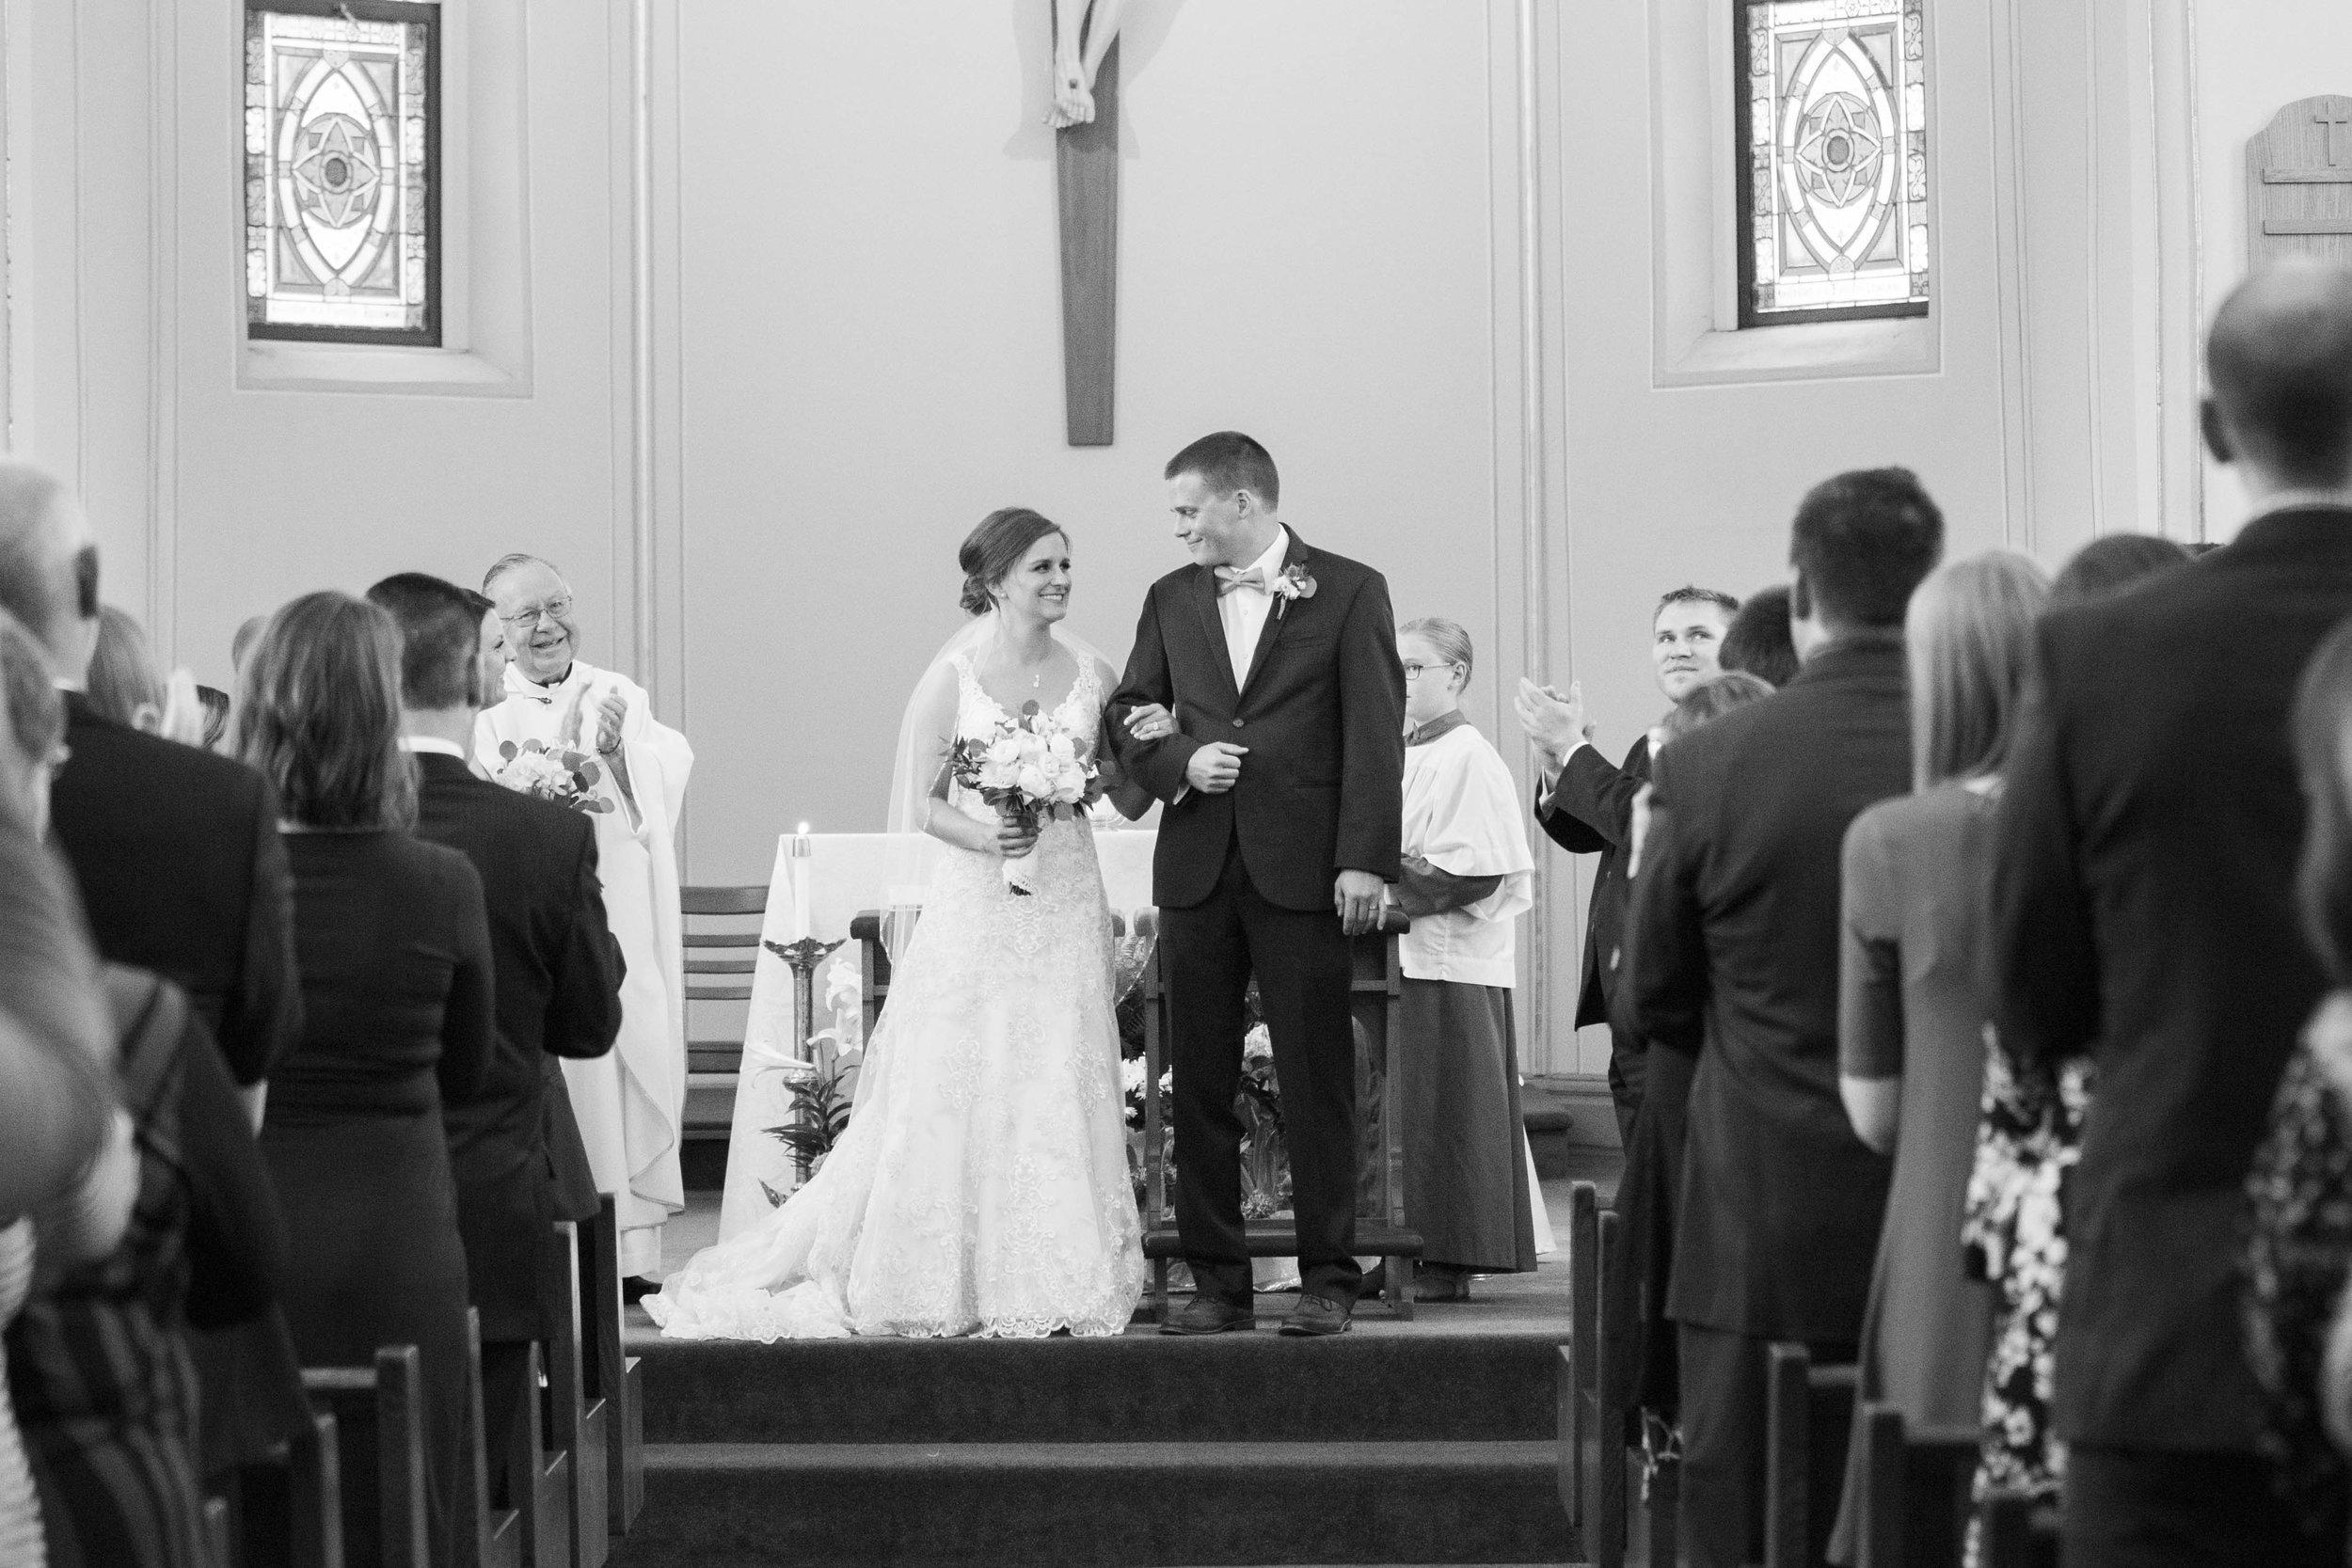 shotbychelsea_wedding_blog-20.jpg